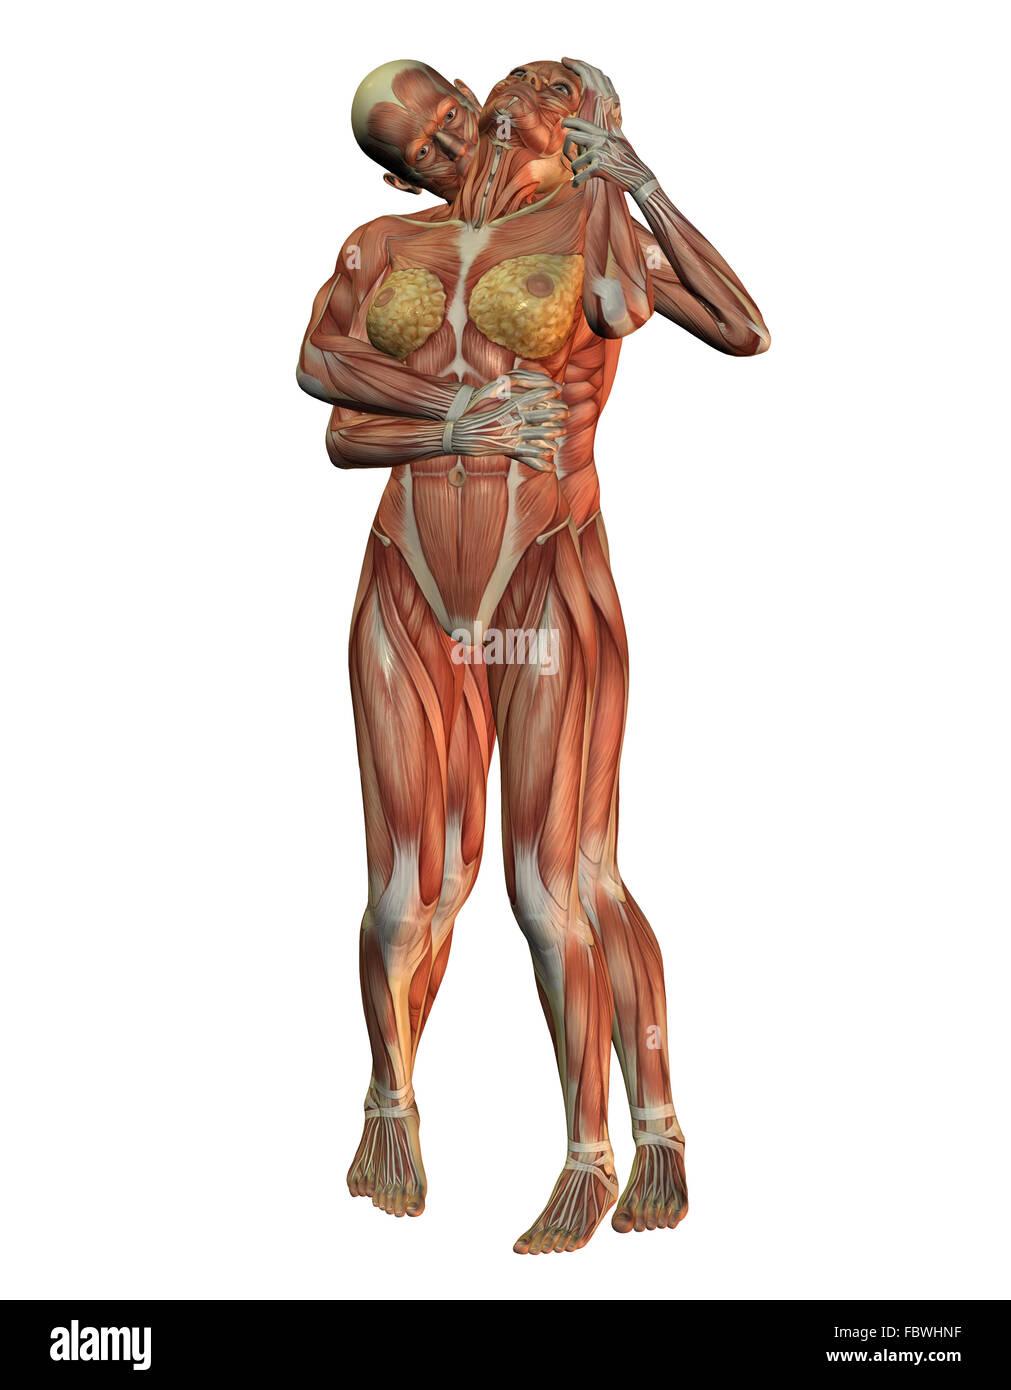 Charmant Muskel Des Halses Galerie - Anatomie Ideen - finotti.info